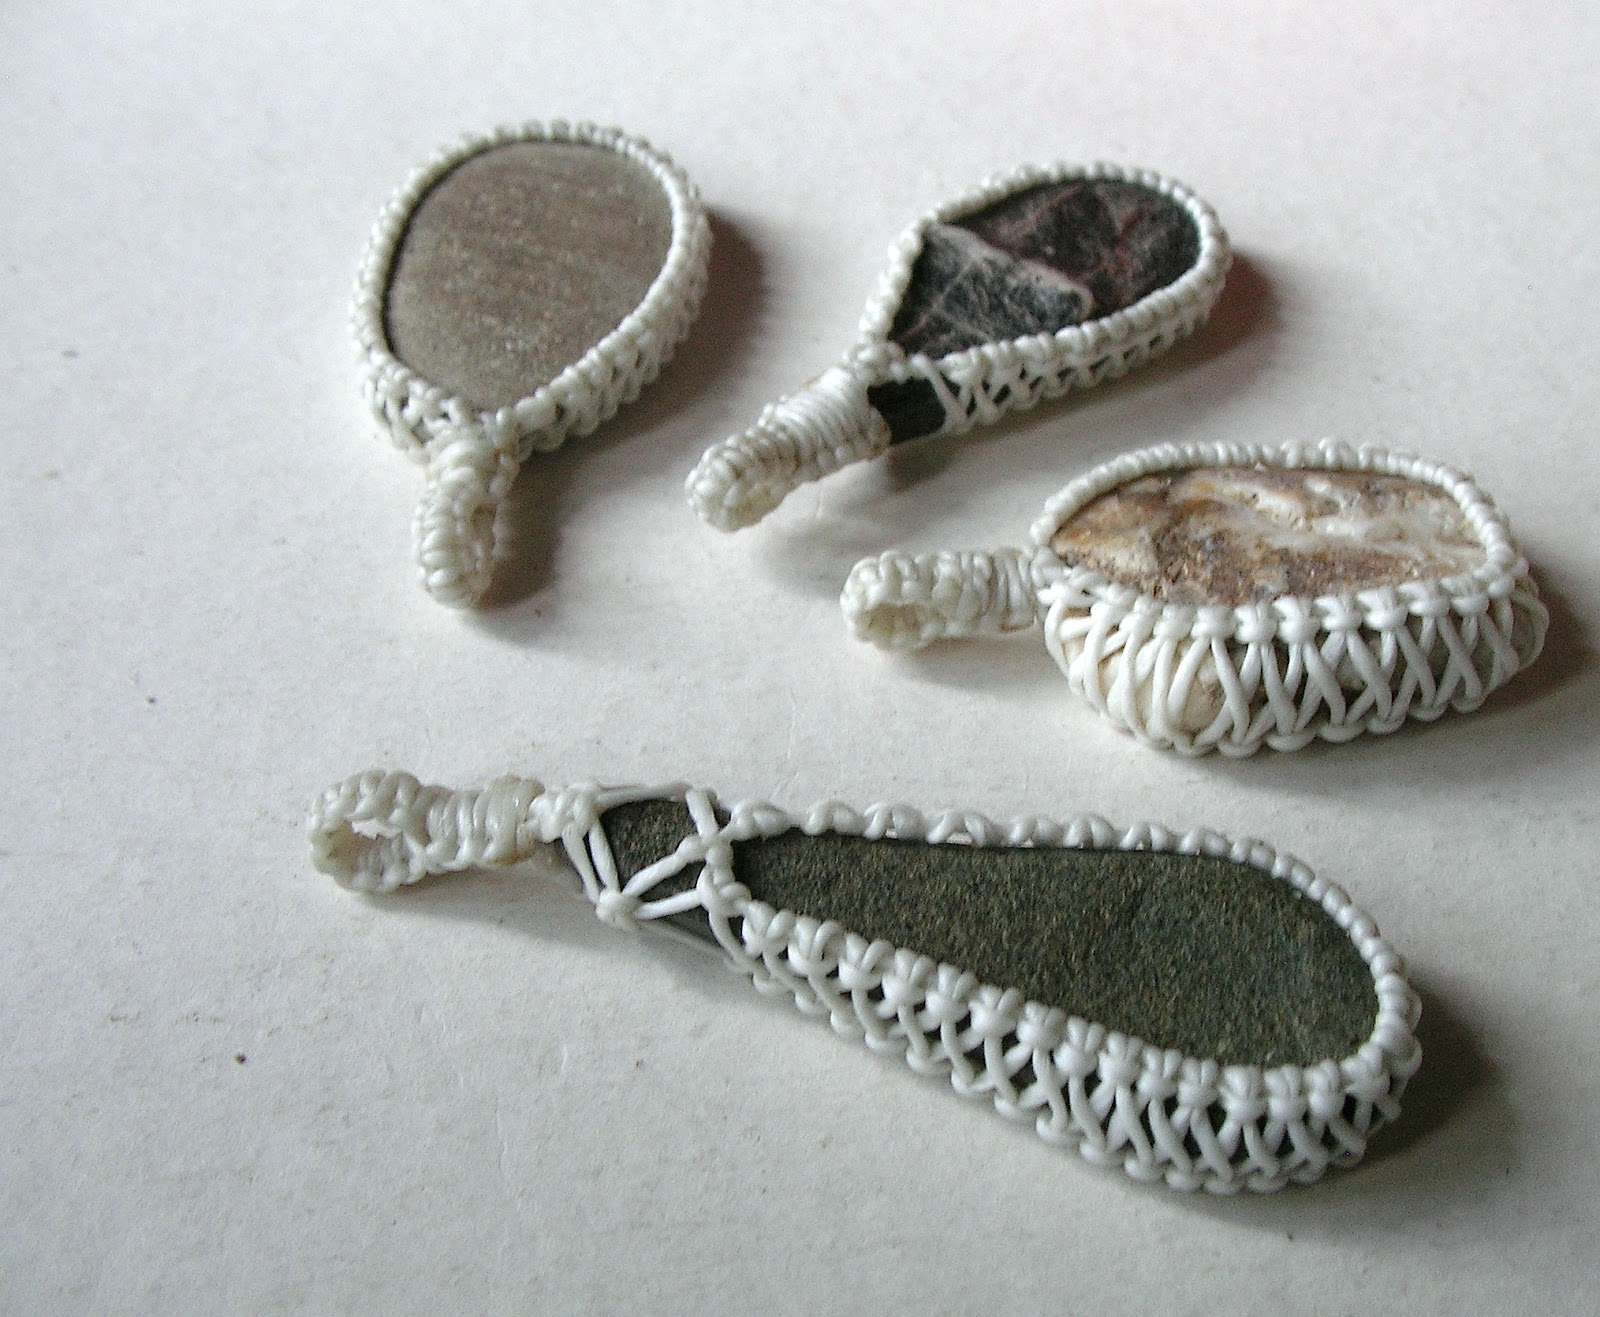 Ecocrafta Macrame : Macrame wrapping : Lace style